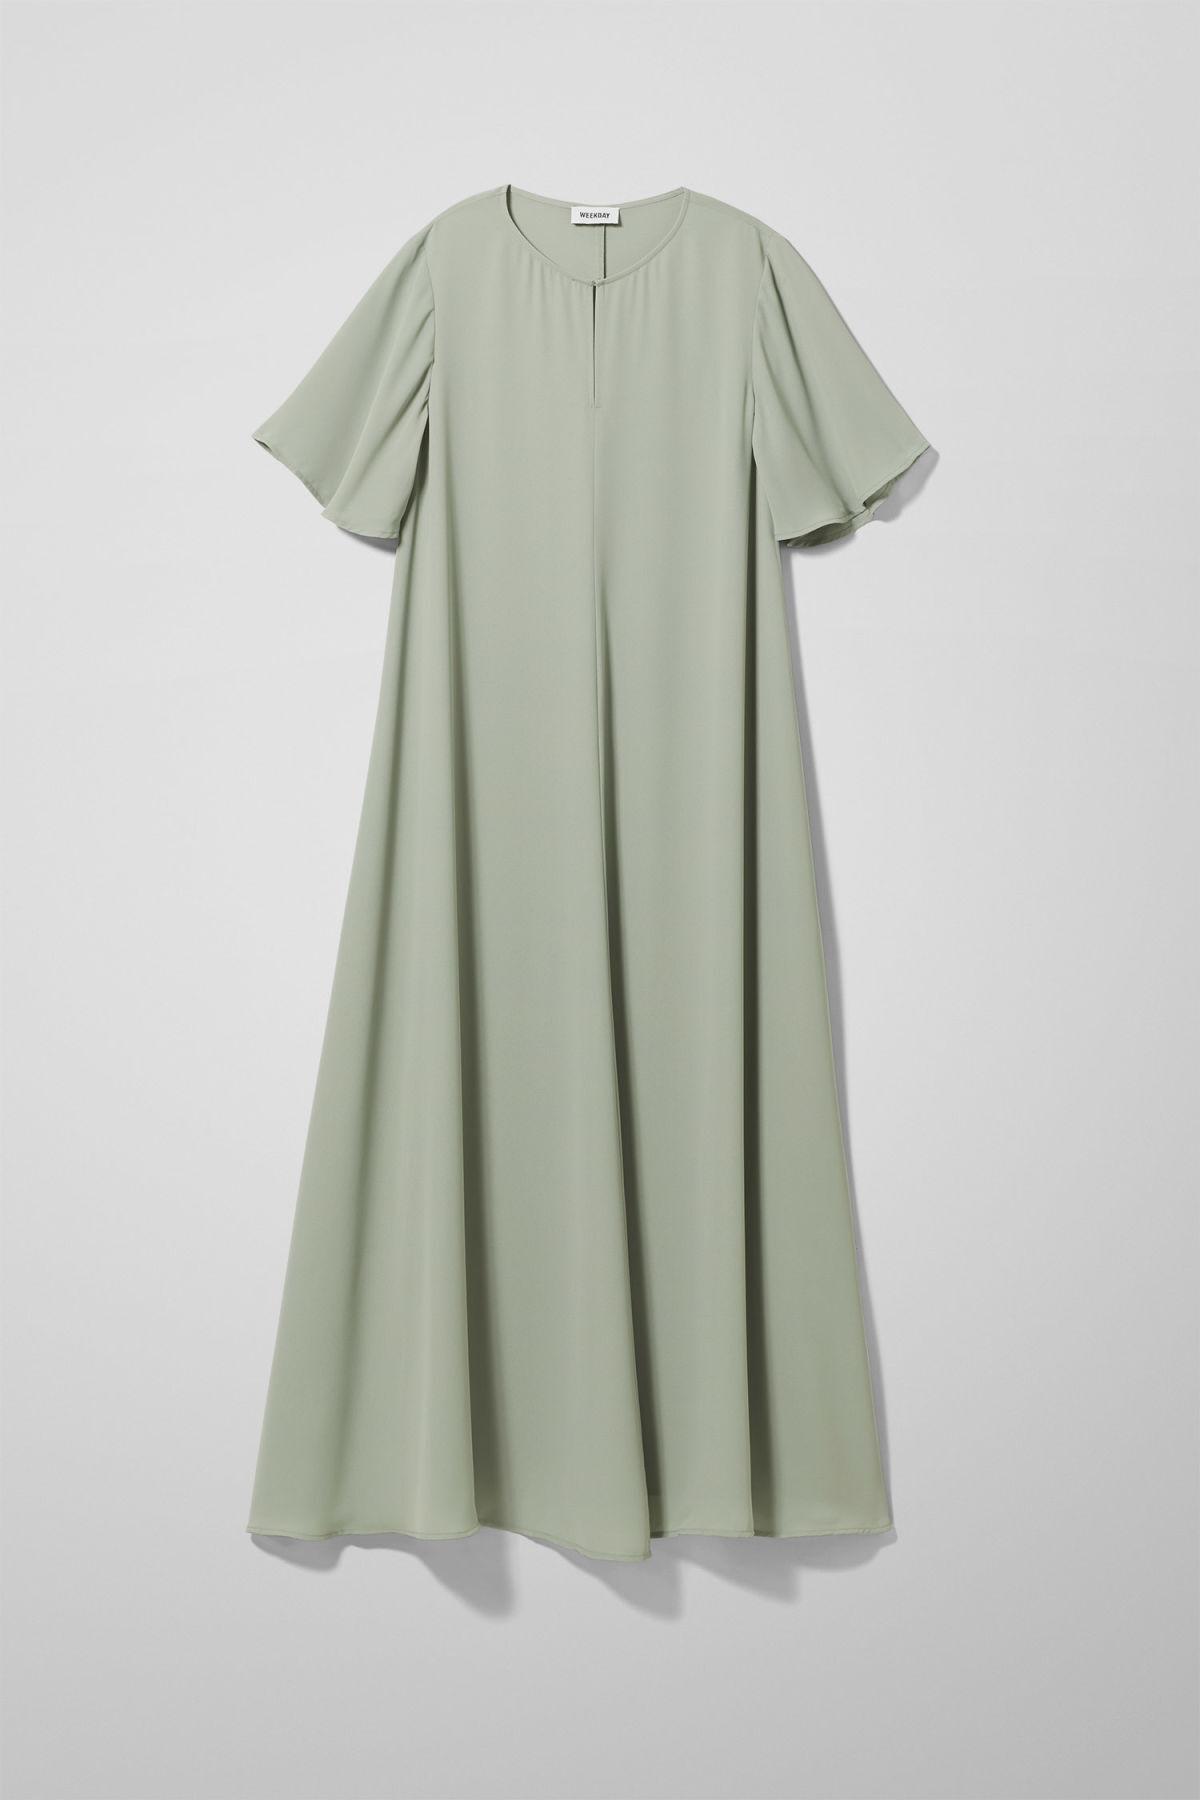 Image of Gloria Dress - Green-XS